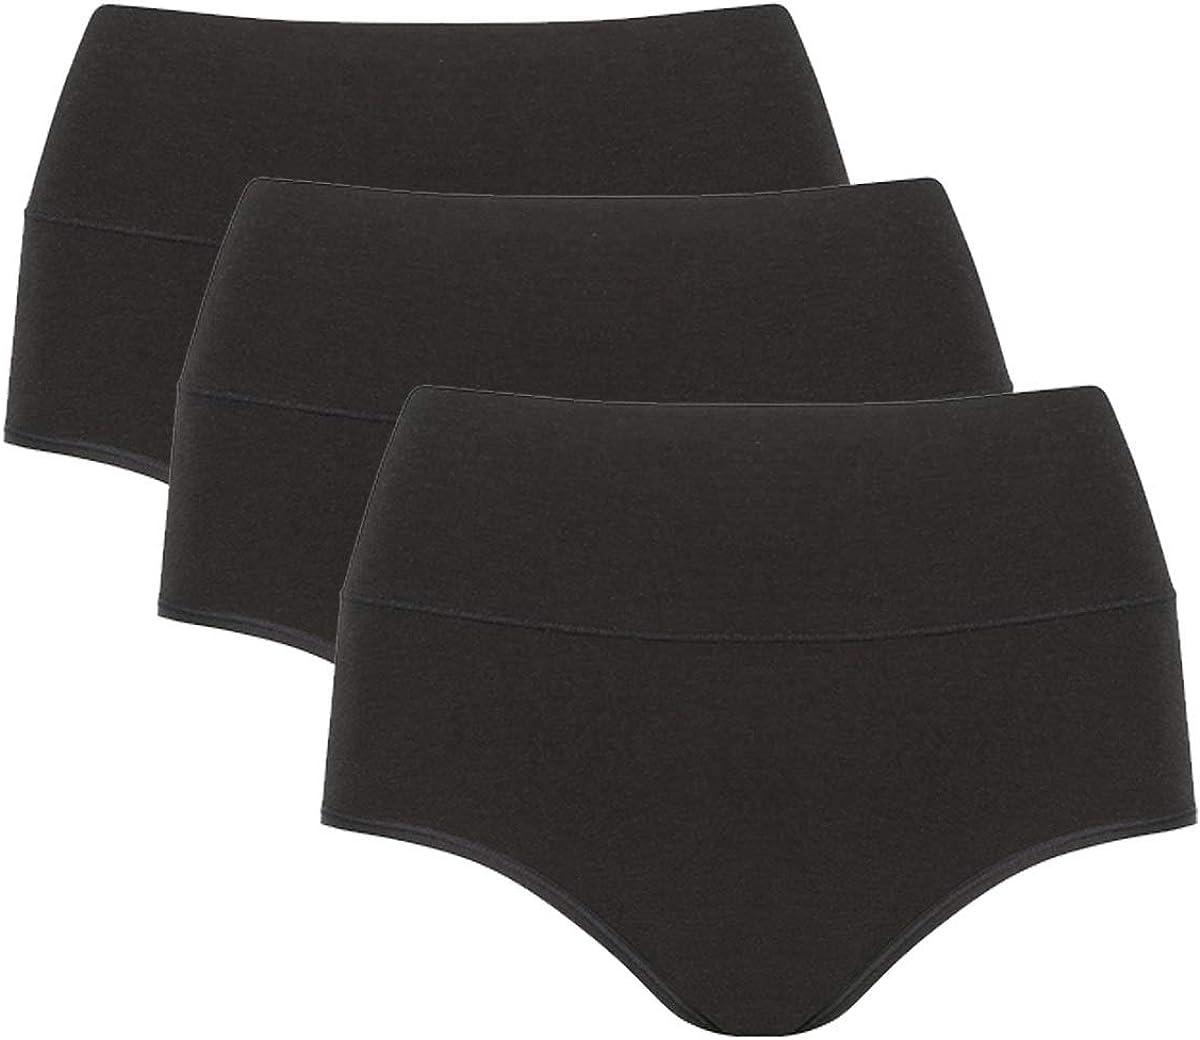 Period Panties//Maternity /& Postpartum Underwear Bambody Absorbent//Overnight High Waist Panty